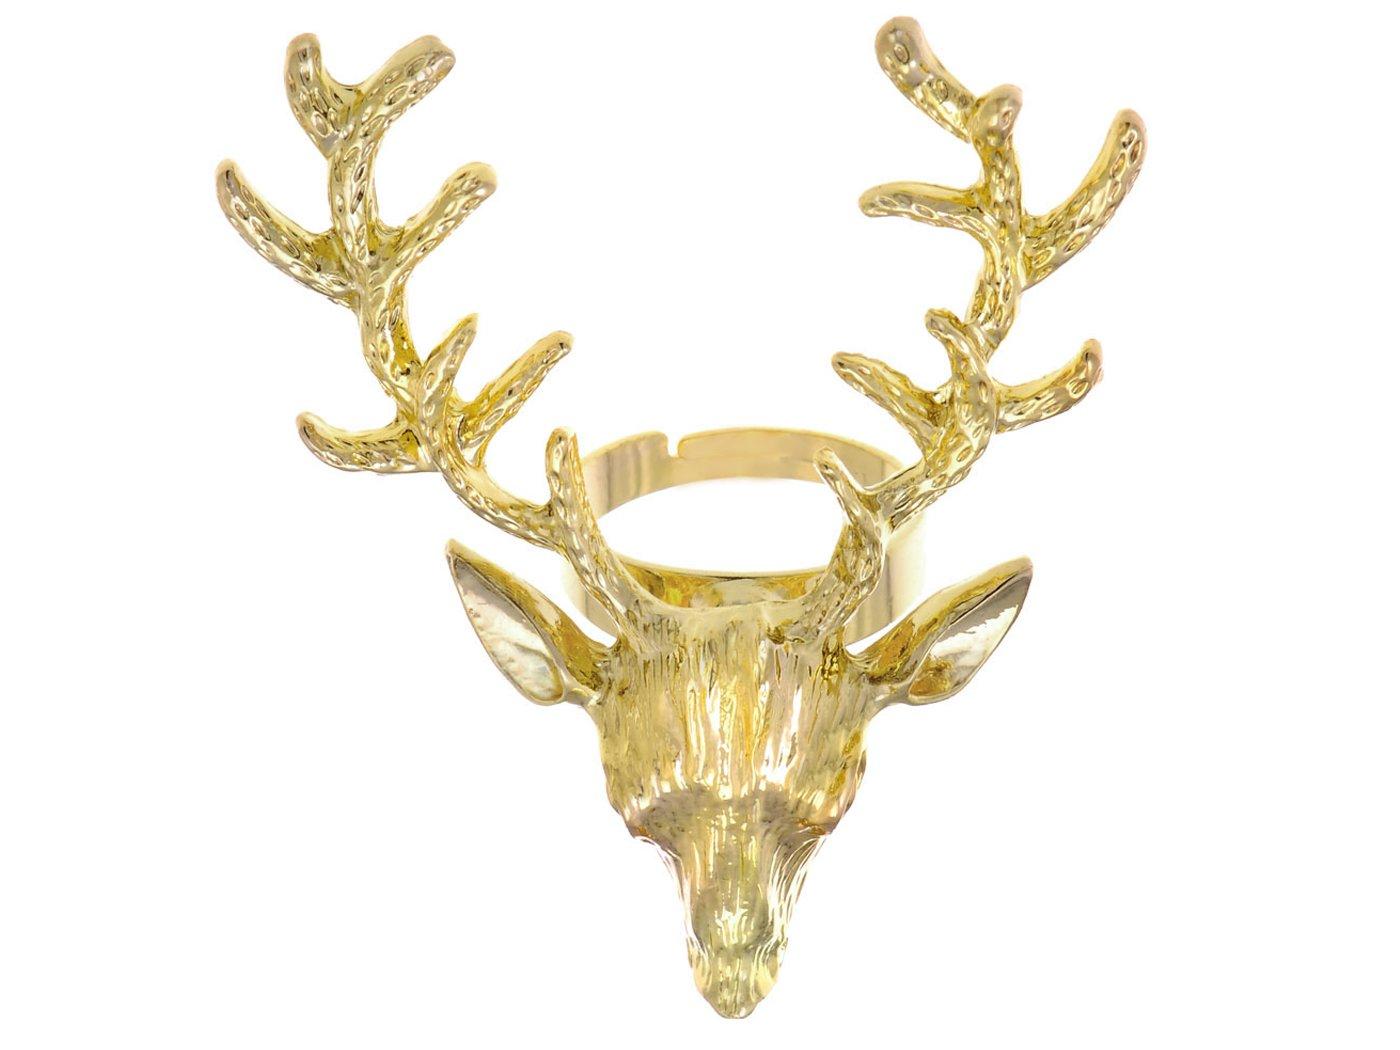 Alilang Womens Vintage Retro Golden Tone Deer Antler Stag Moose Elk Head Animal Adjustable Ring